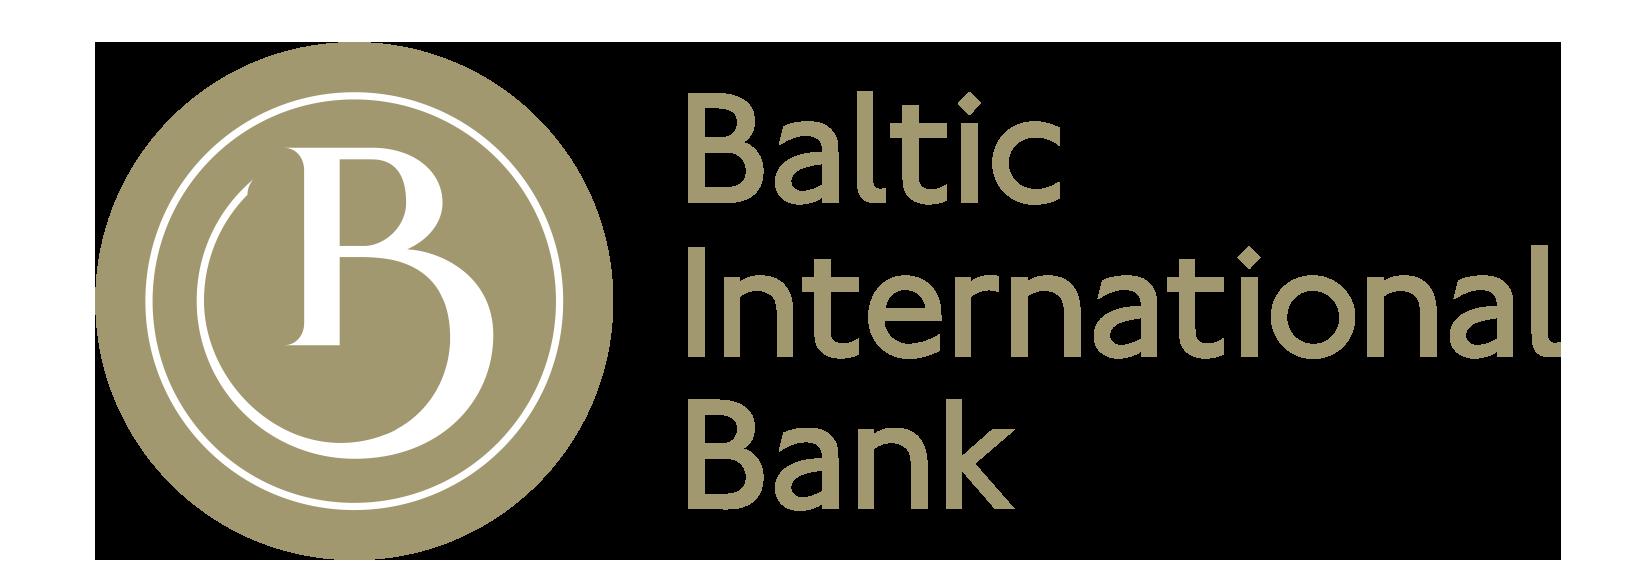 Baltic International Bank logotips